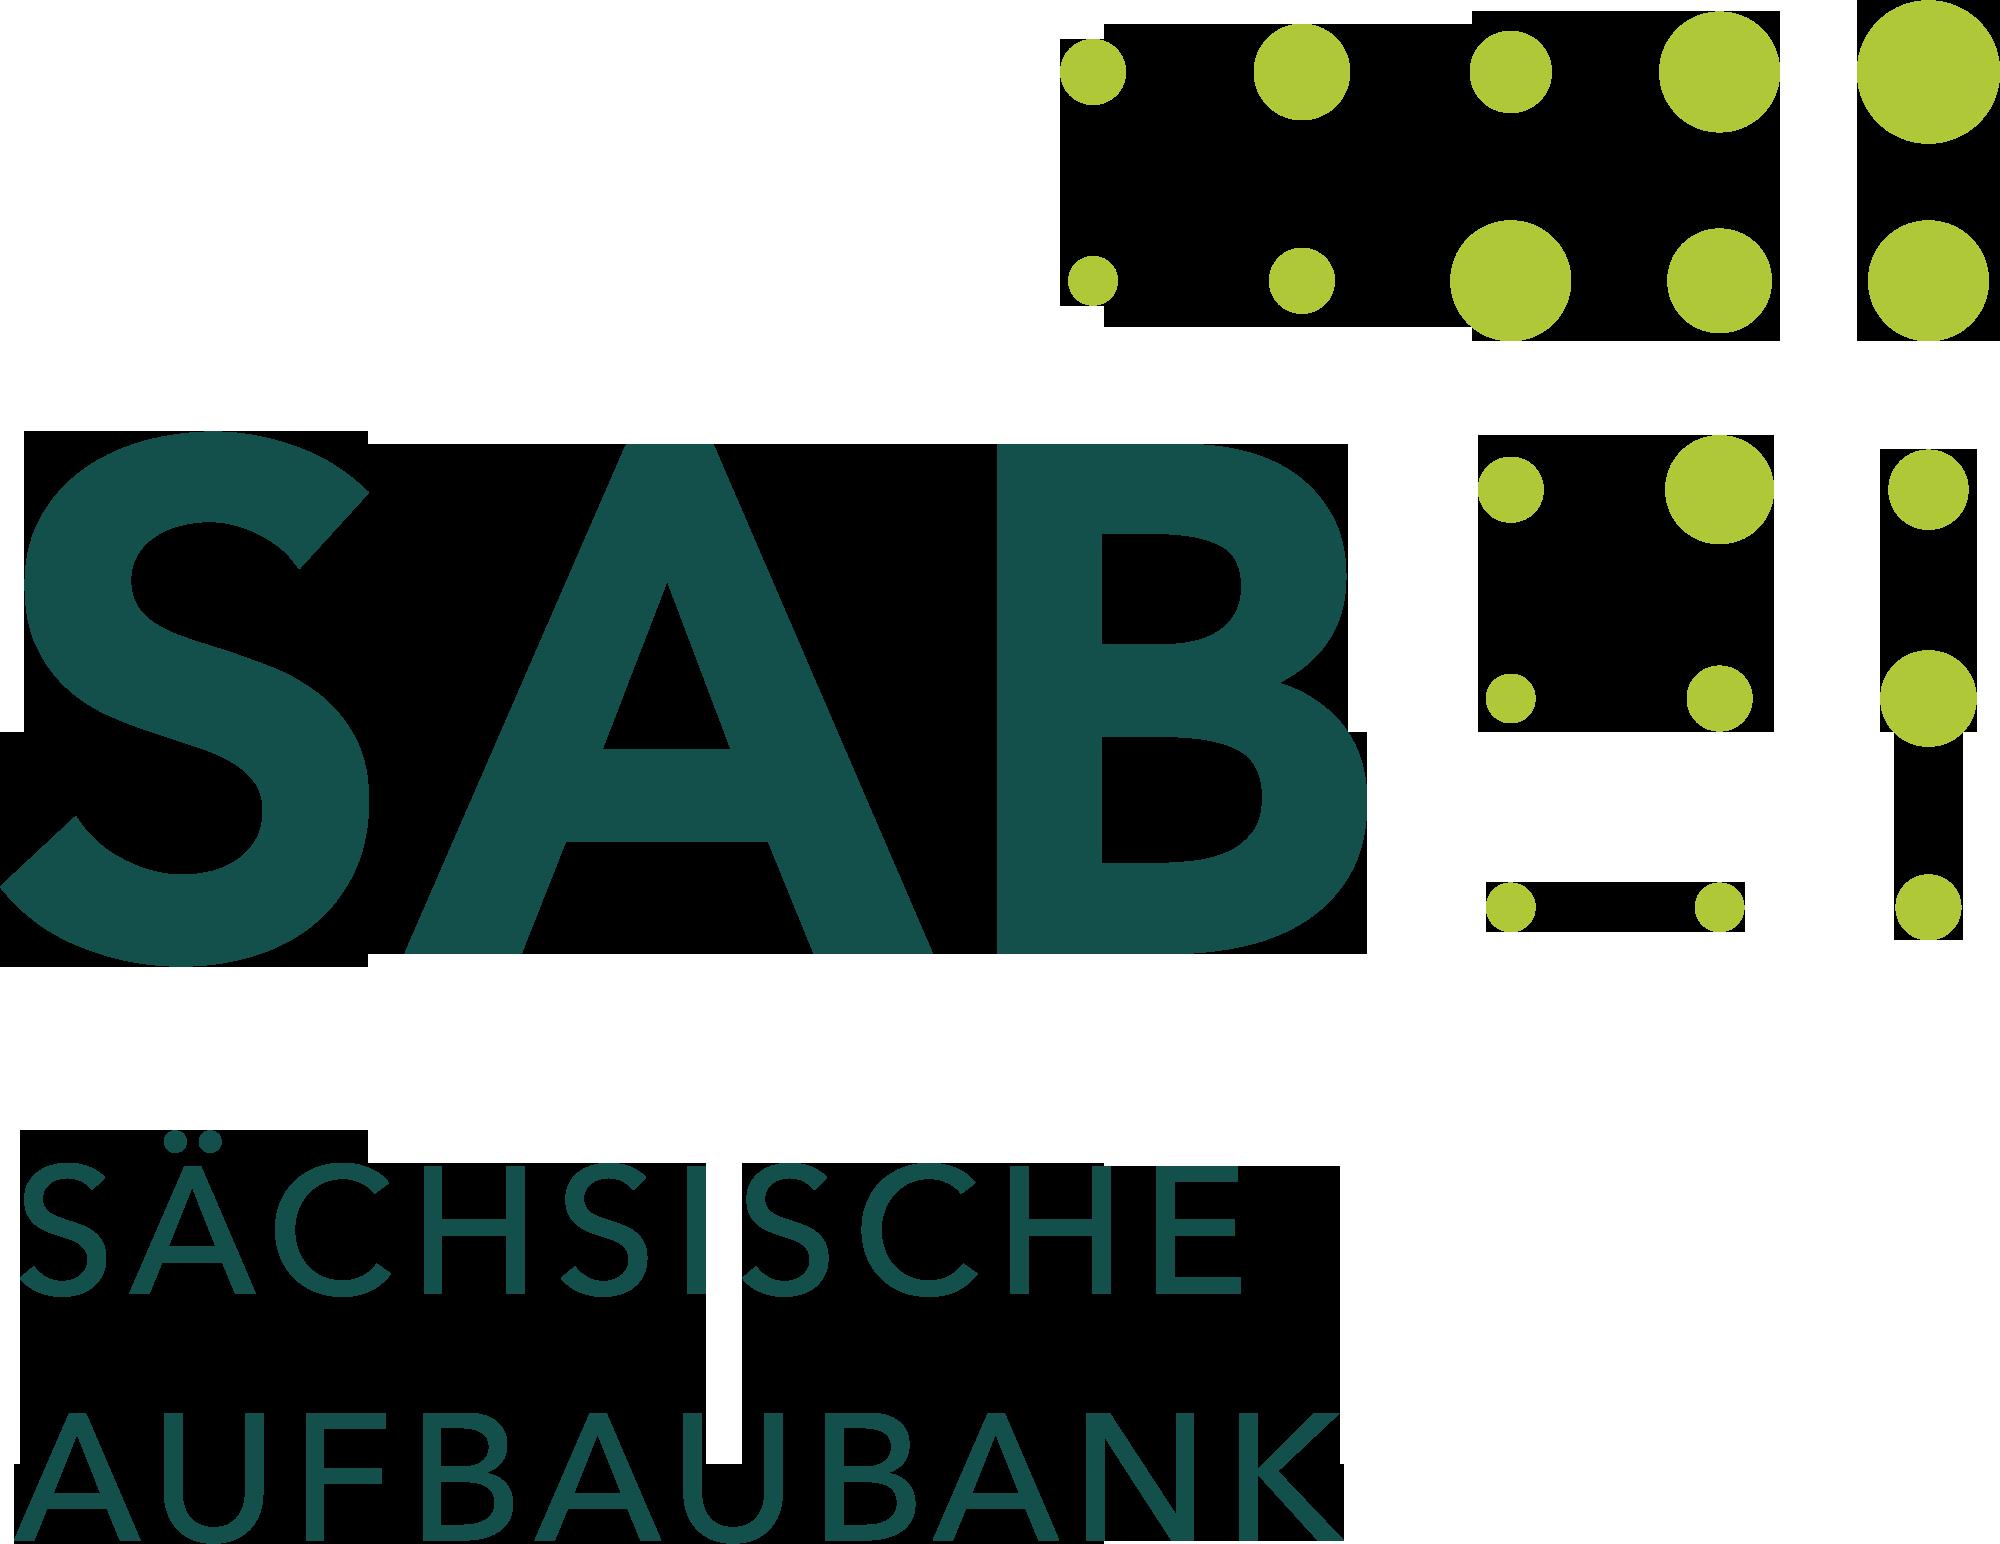 Sächsische AufbauBank